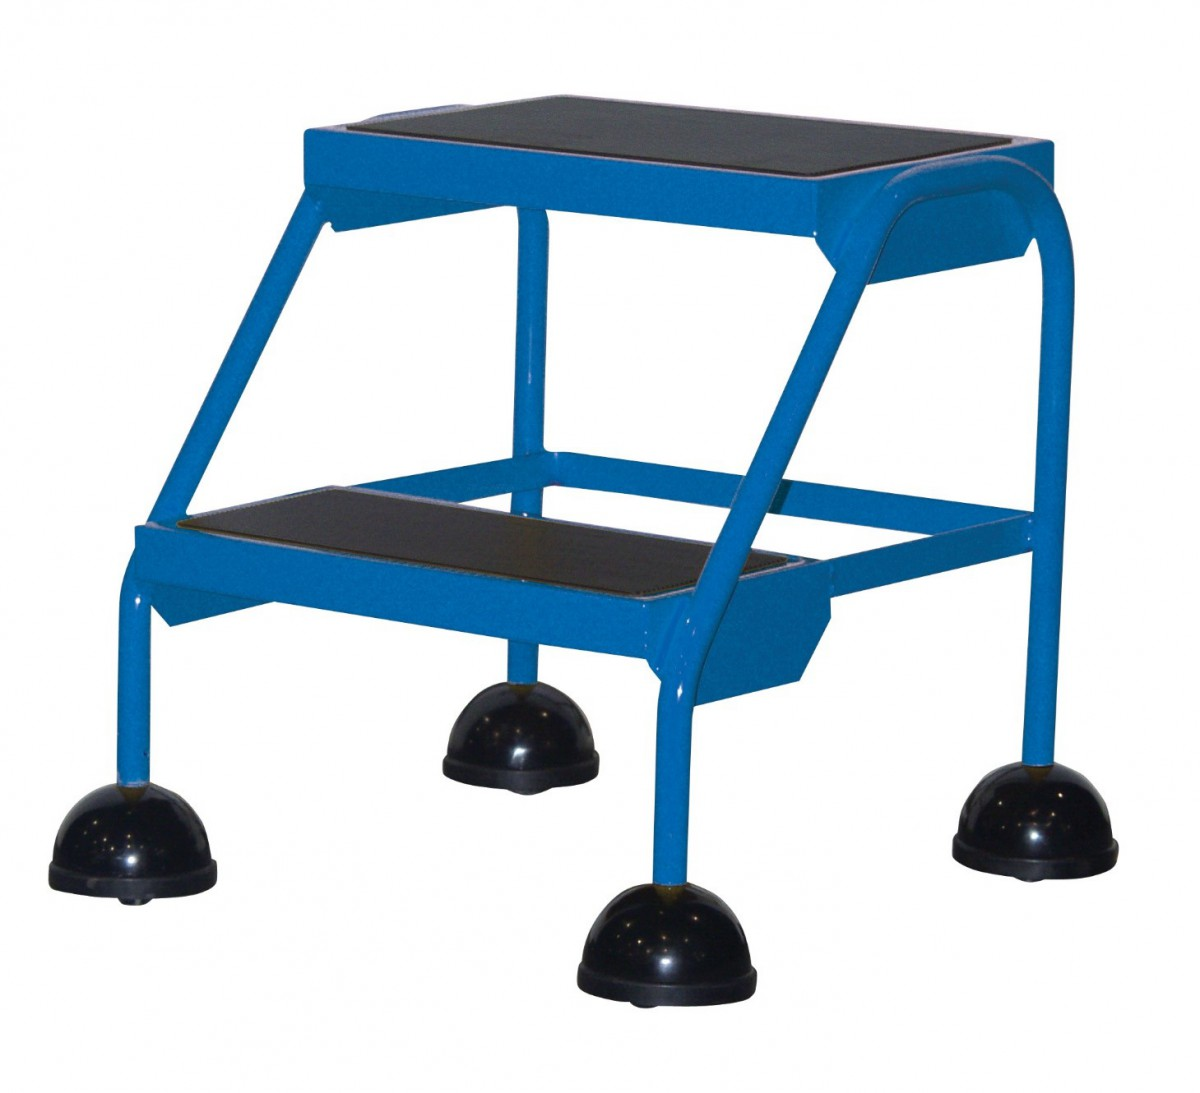 rolling step kick dp pura home premium com steel with black rubber slip dent lbs proof platform capacity rust stool load non casa amazon